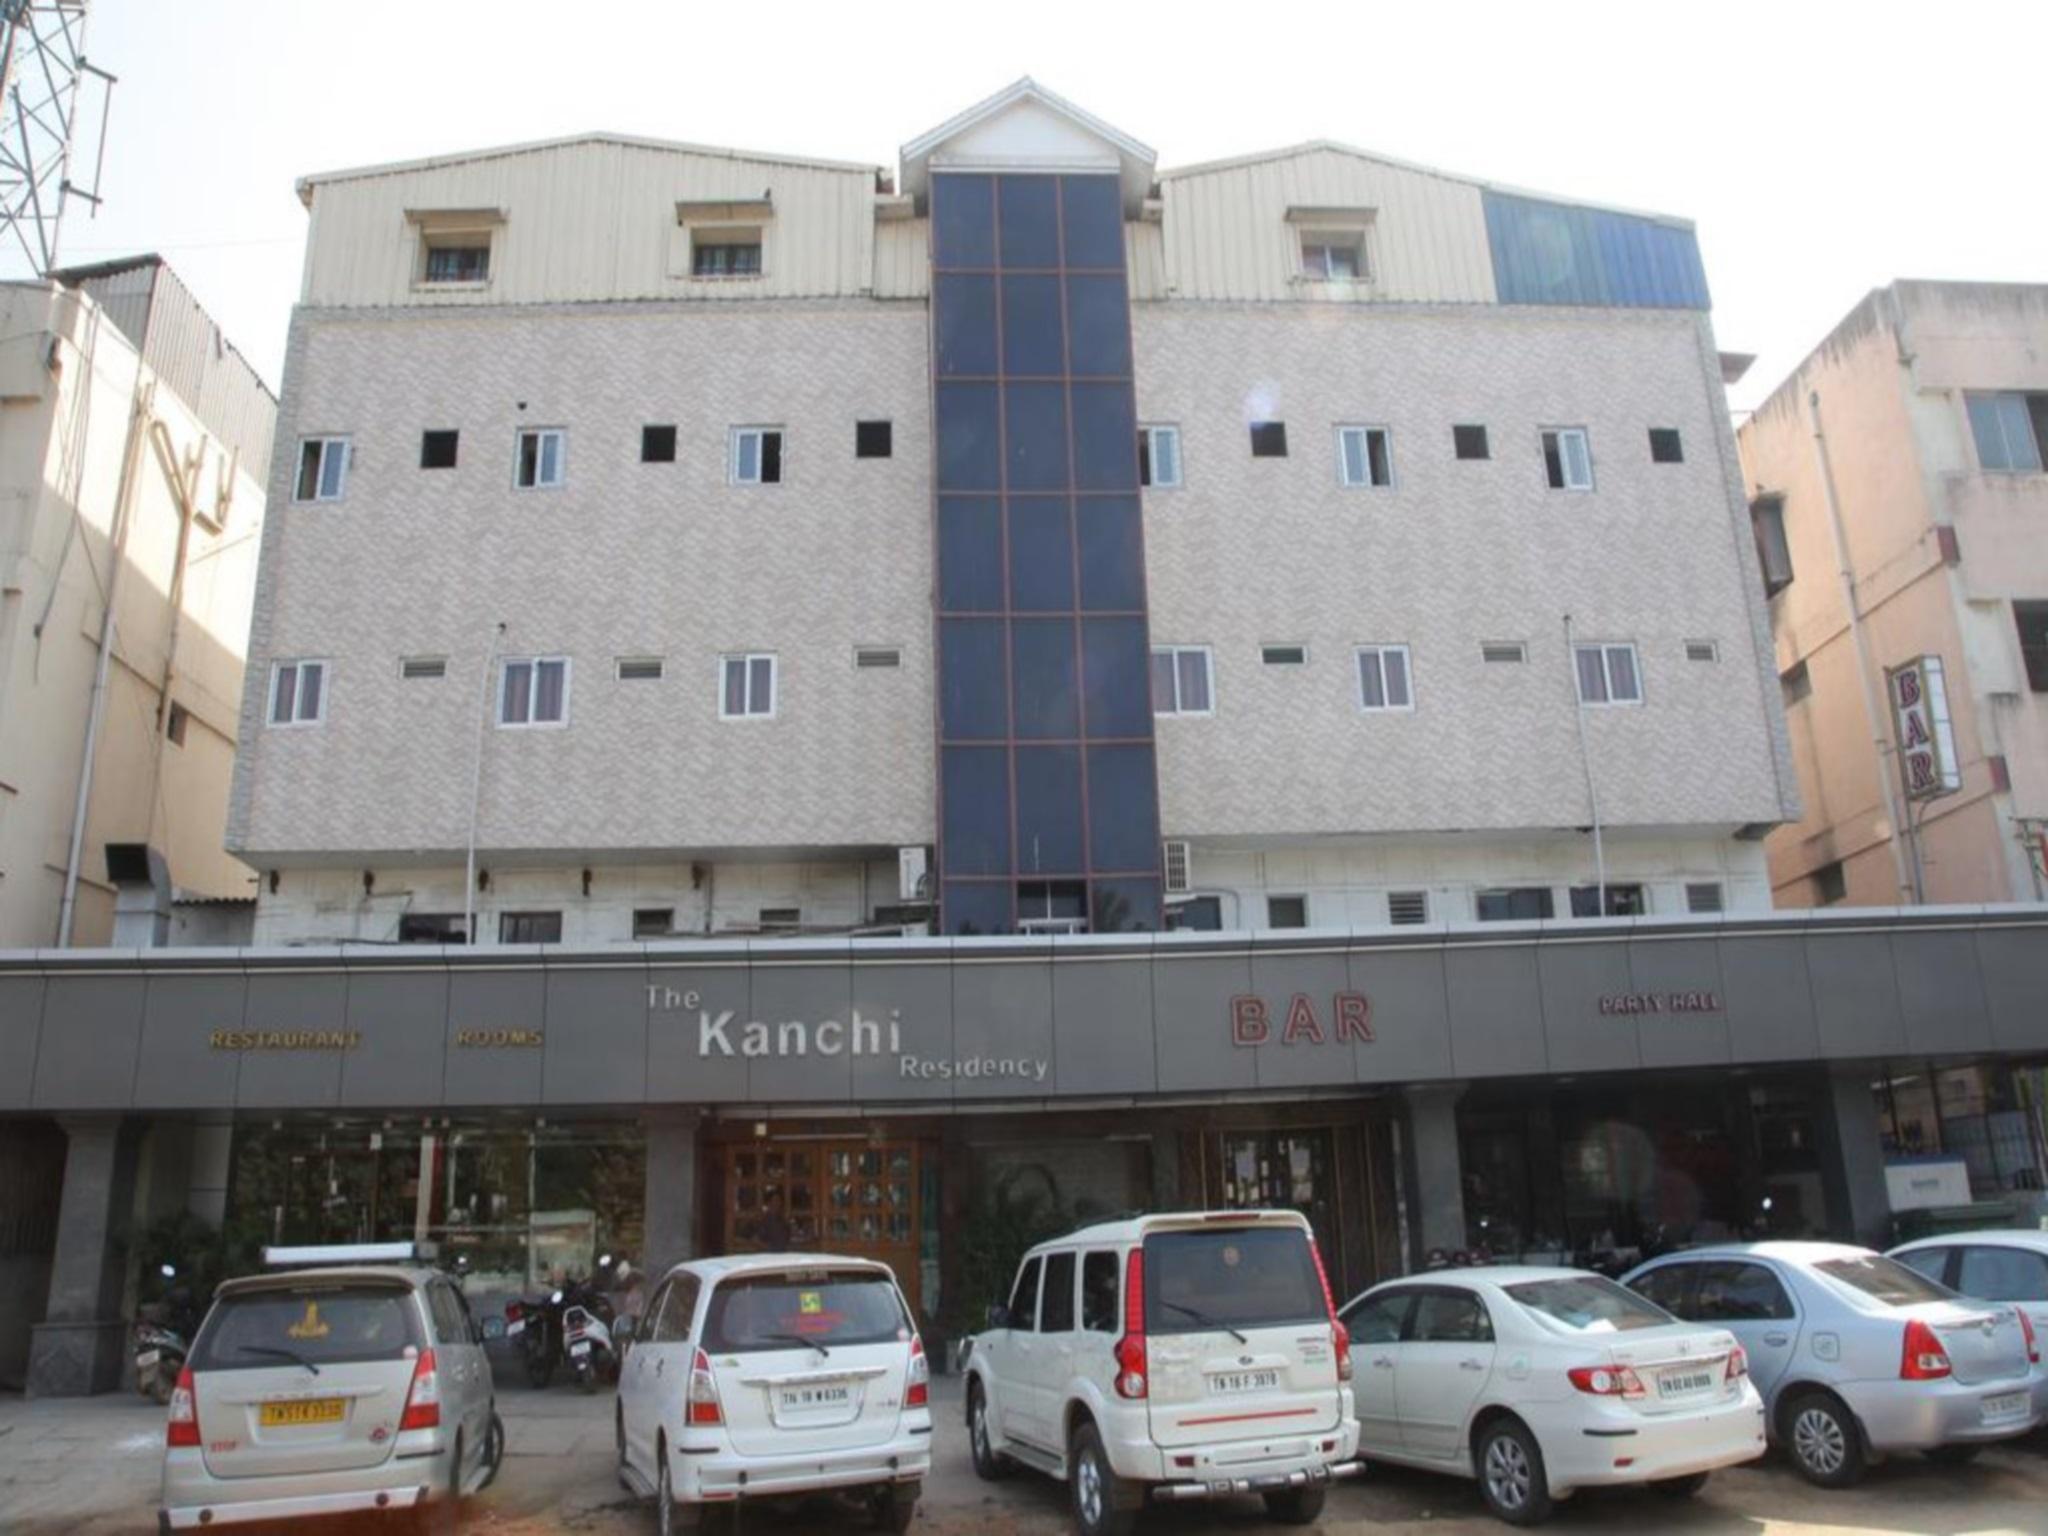 The Kanchi Residency